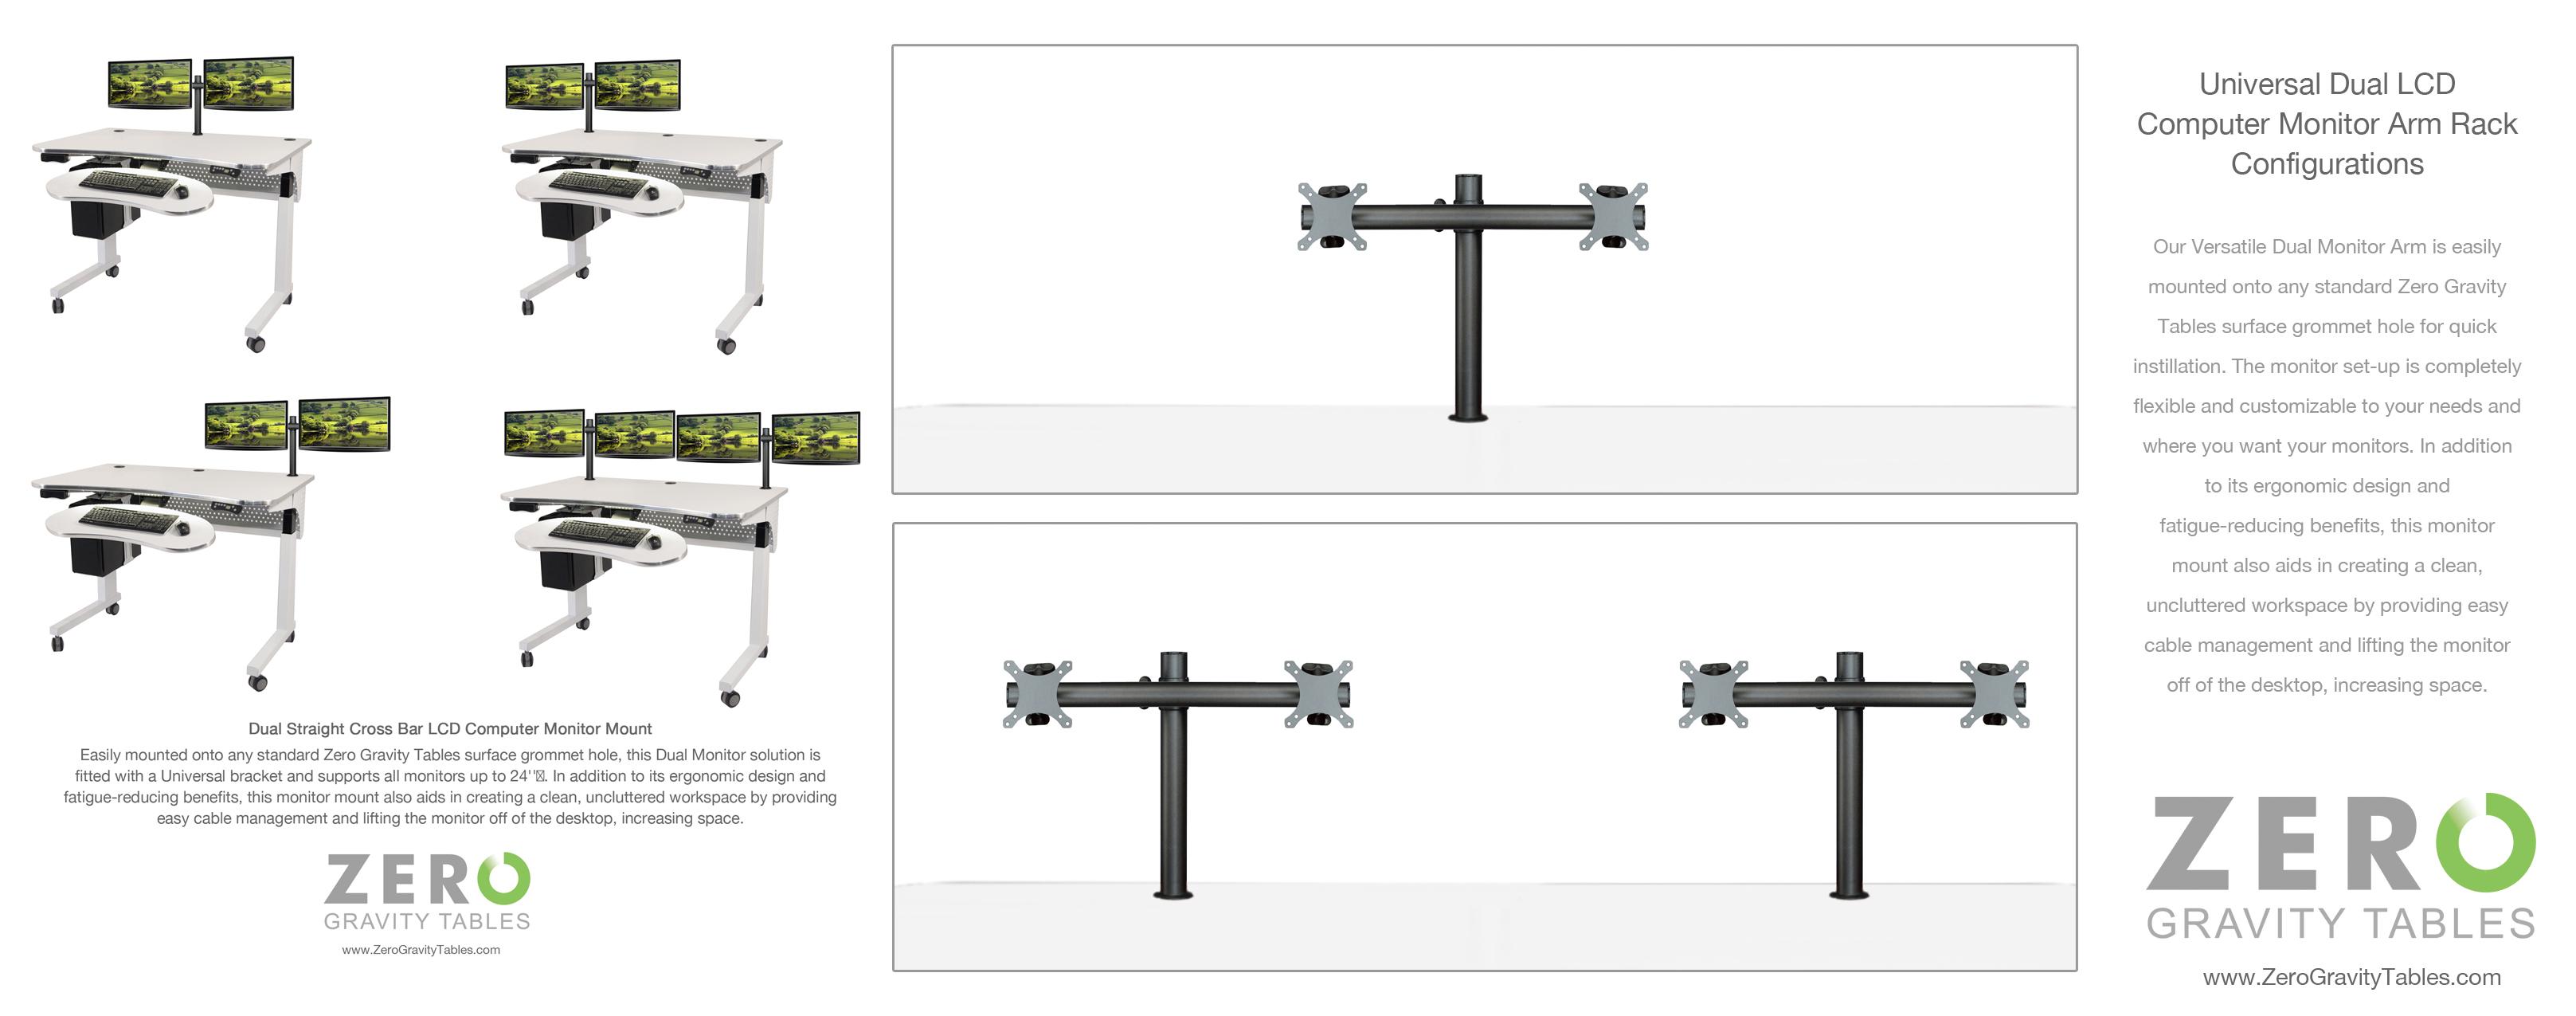 -full-2-universal-dual-lcd-monitor-arm-computer-screen-set-up-setup-set-up-for-height-adjustable-desks-standing-office-solutions-set-up-setup.jpg